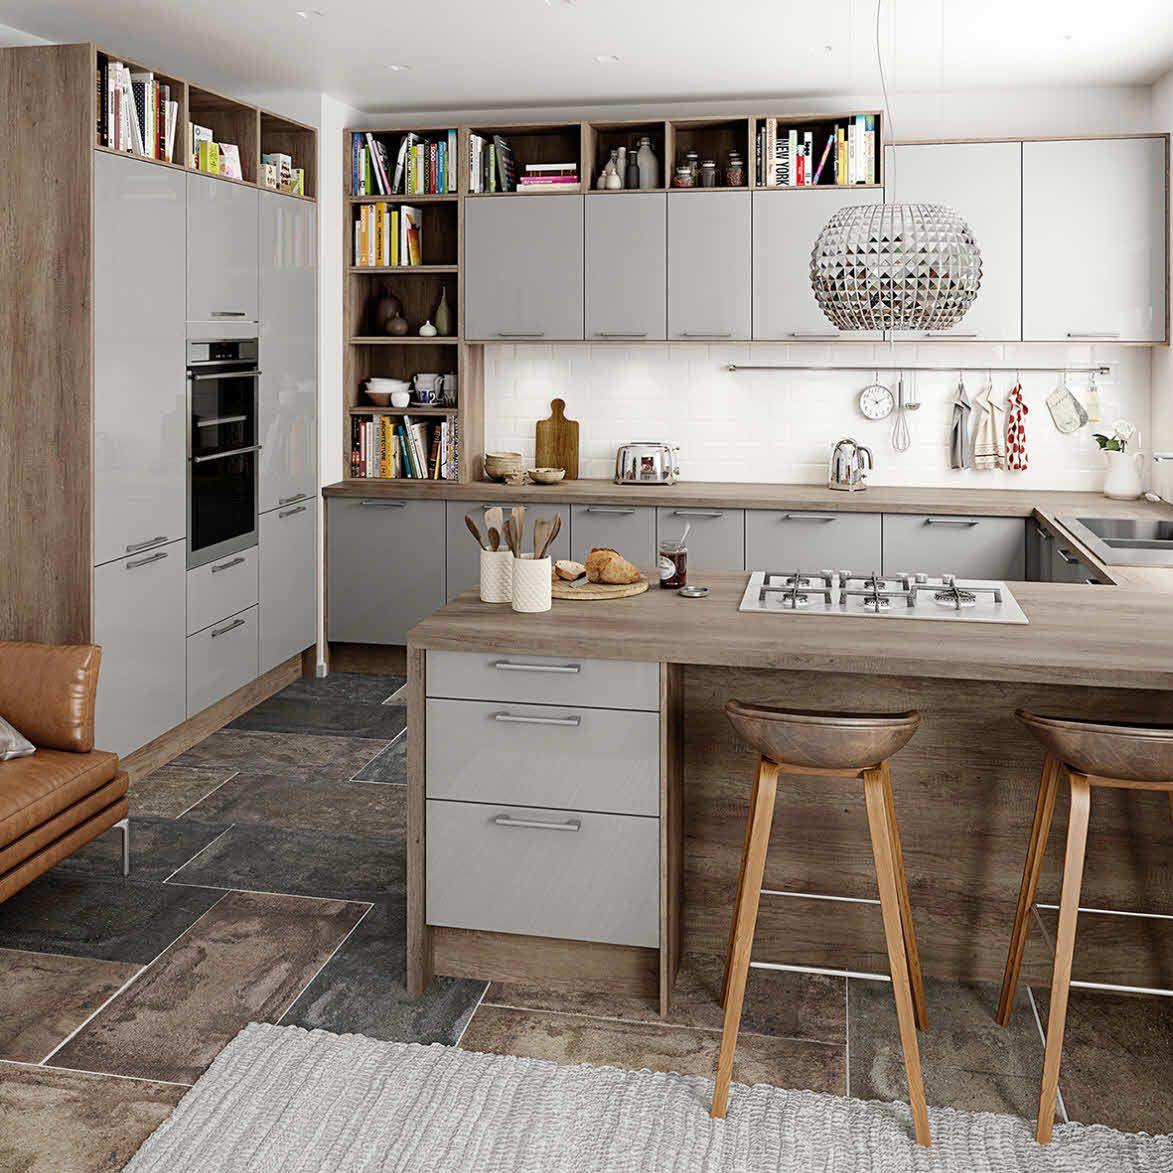 Magnet kitchens google search kitchens pinterest for Kitchen ideas magnet